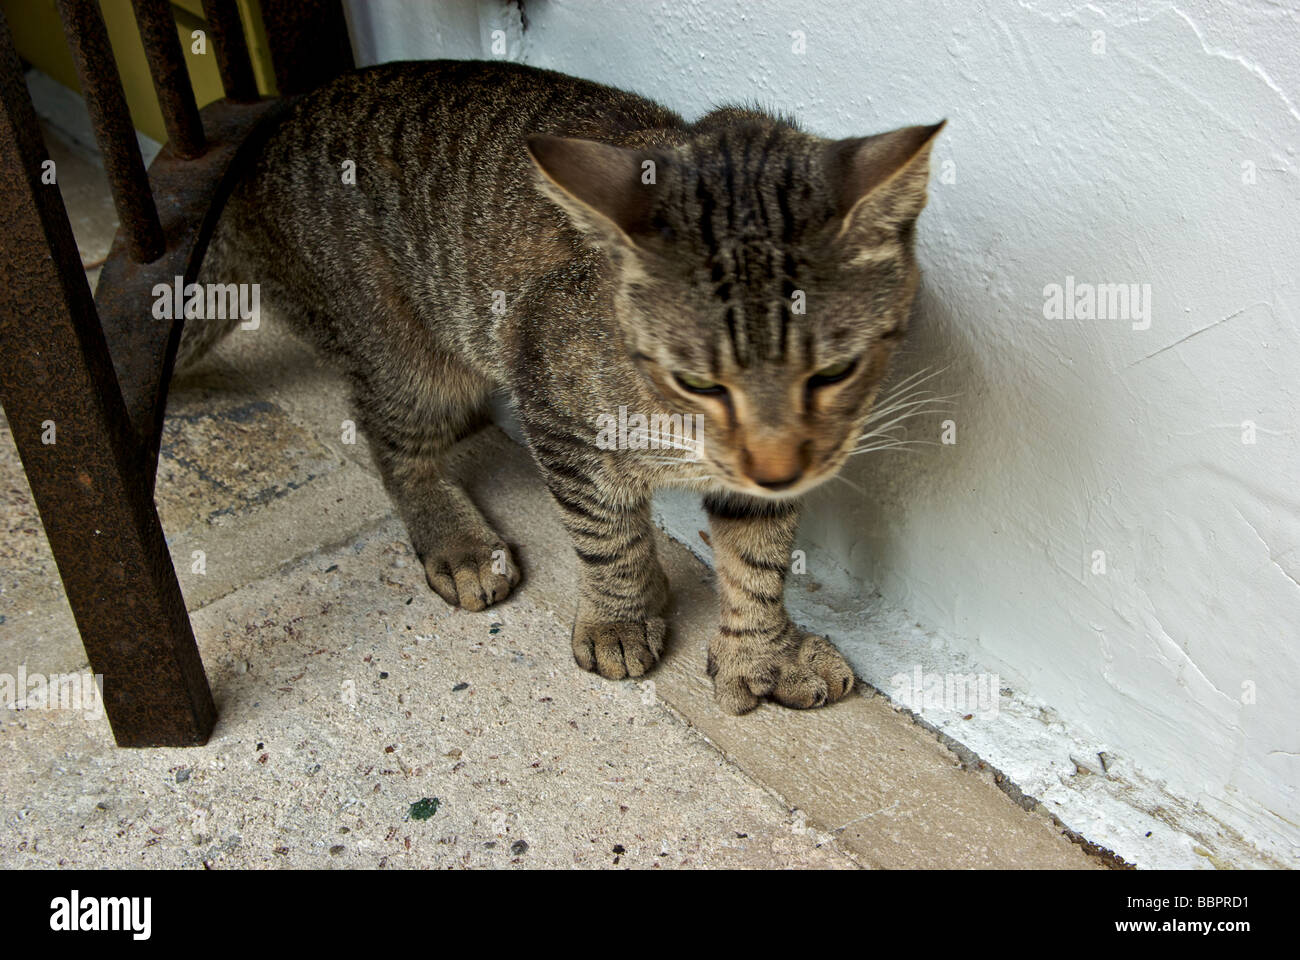 Feline Descendant Of The Famous Six Toed Polydactyl Cats Ernest